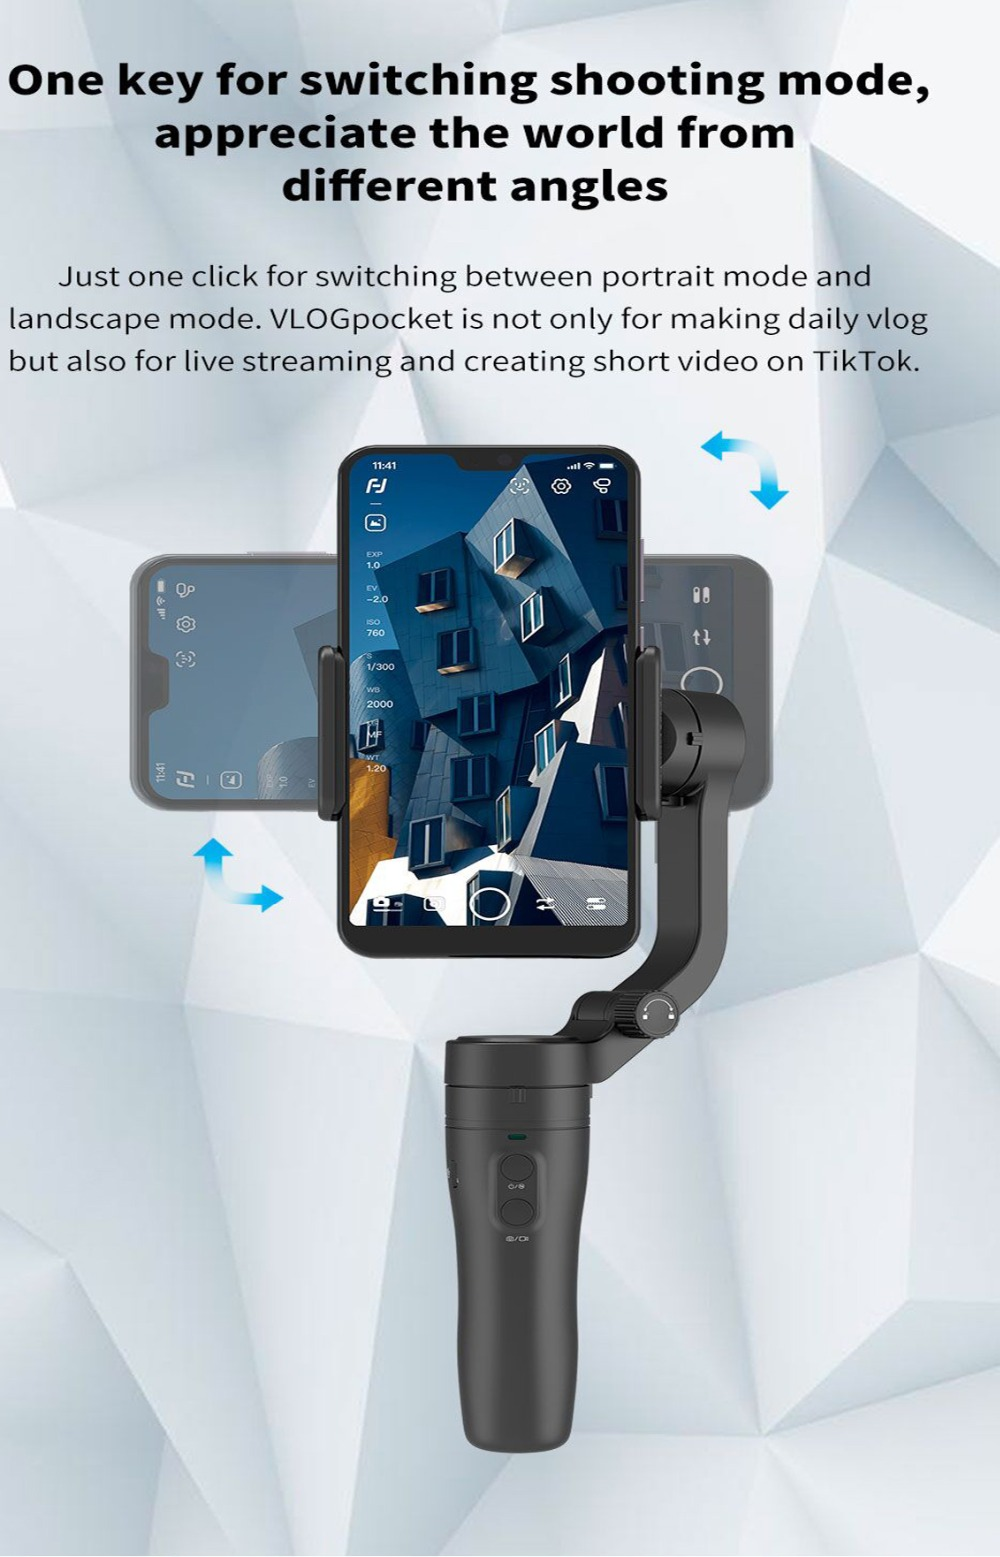 Cardan dobrável do telefone do bolso de feiyutech vlog 3 axis do punho fornecedor do cardan para o iphone